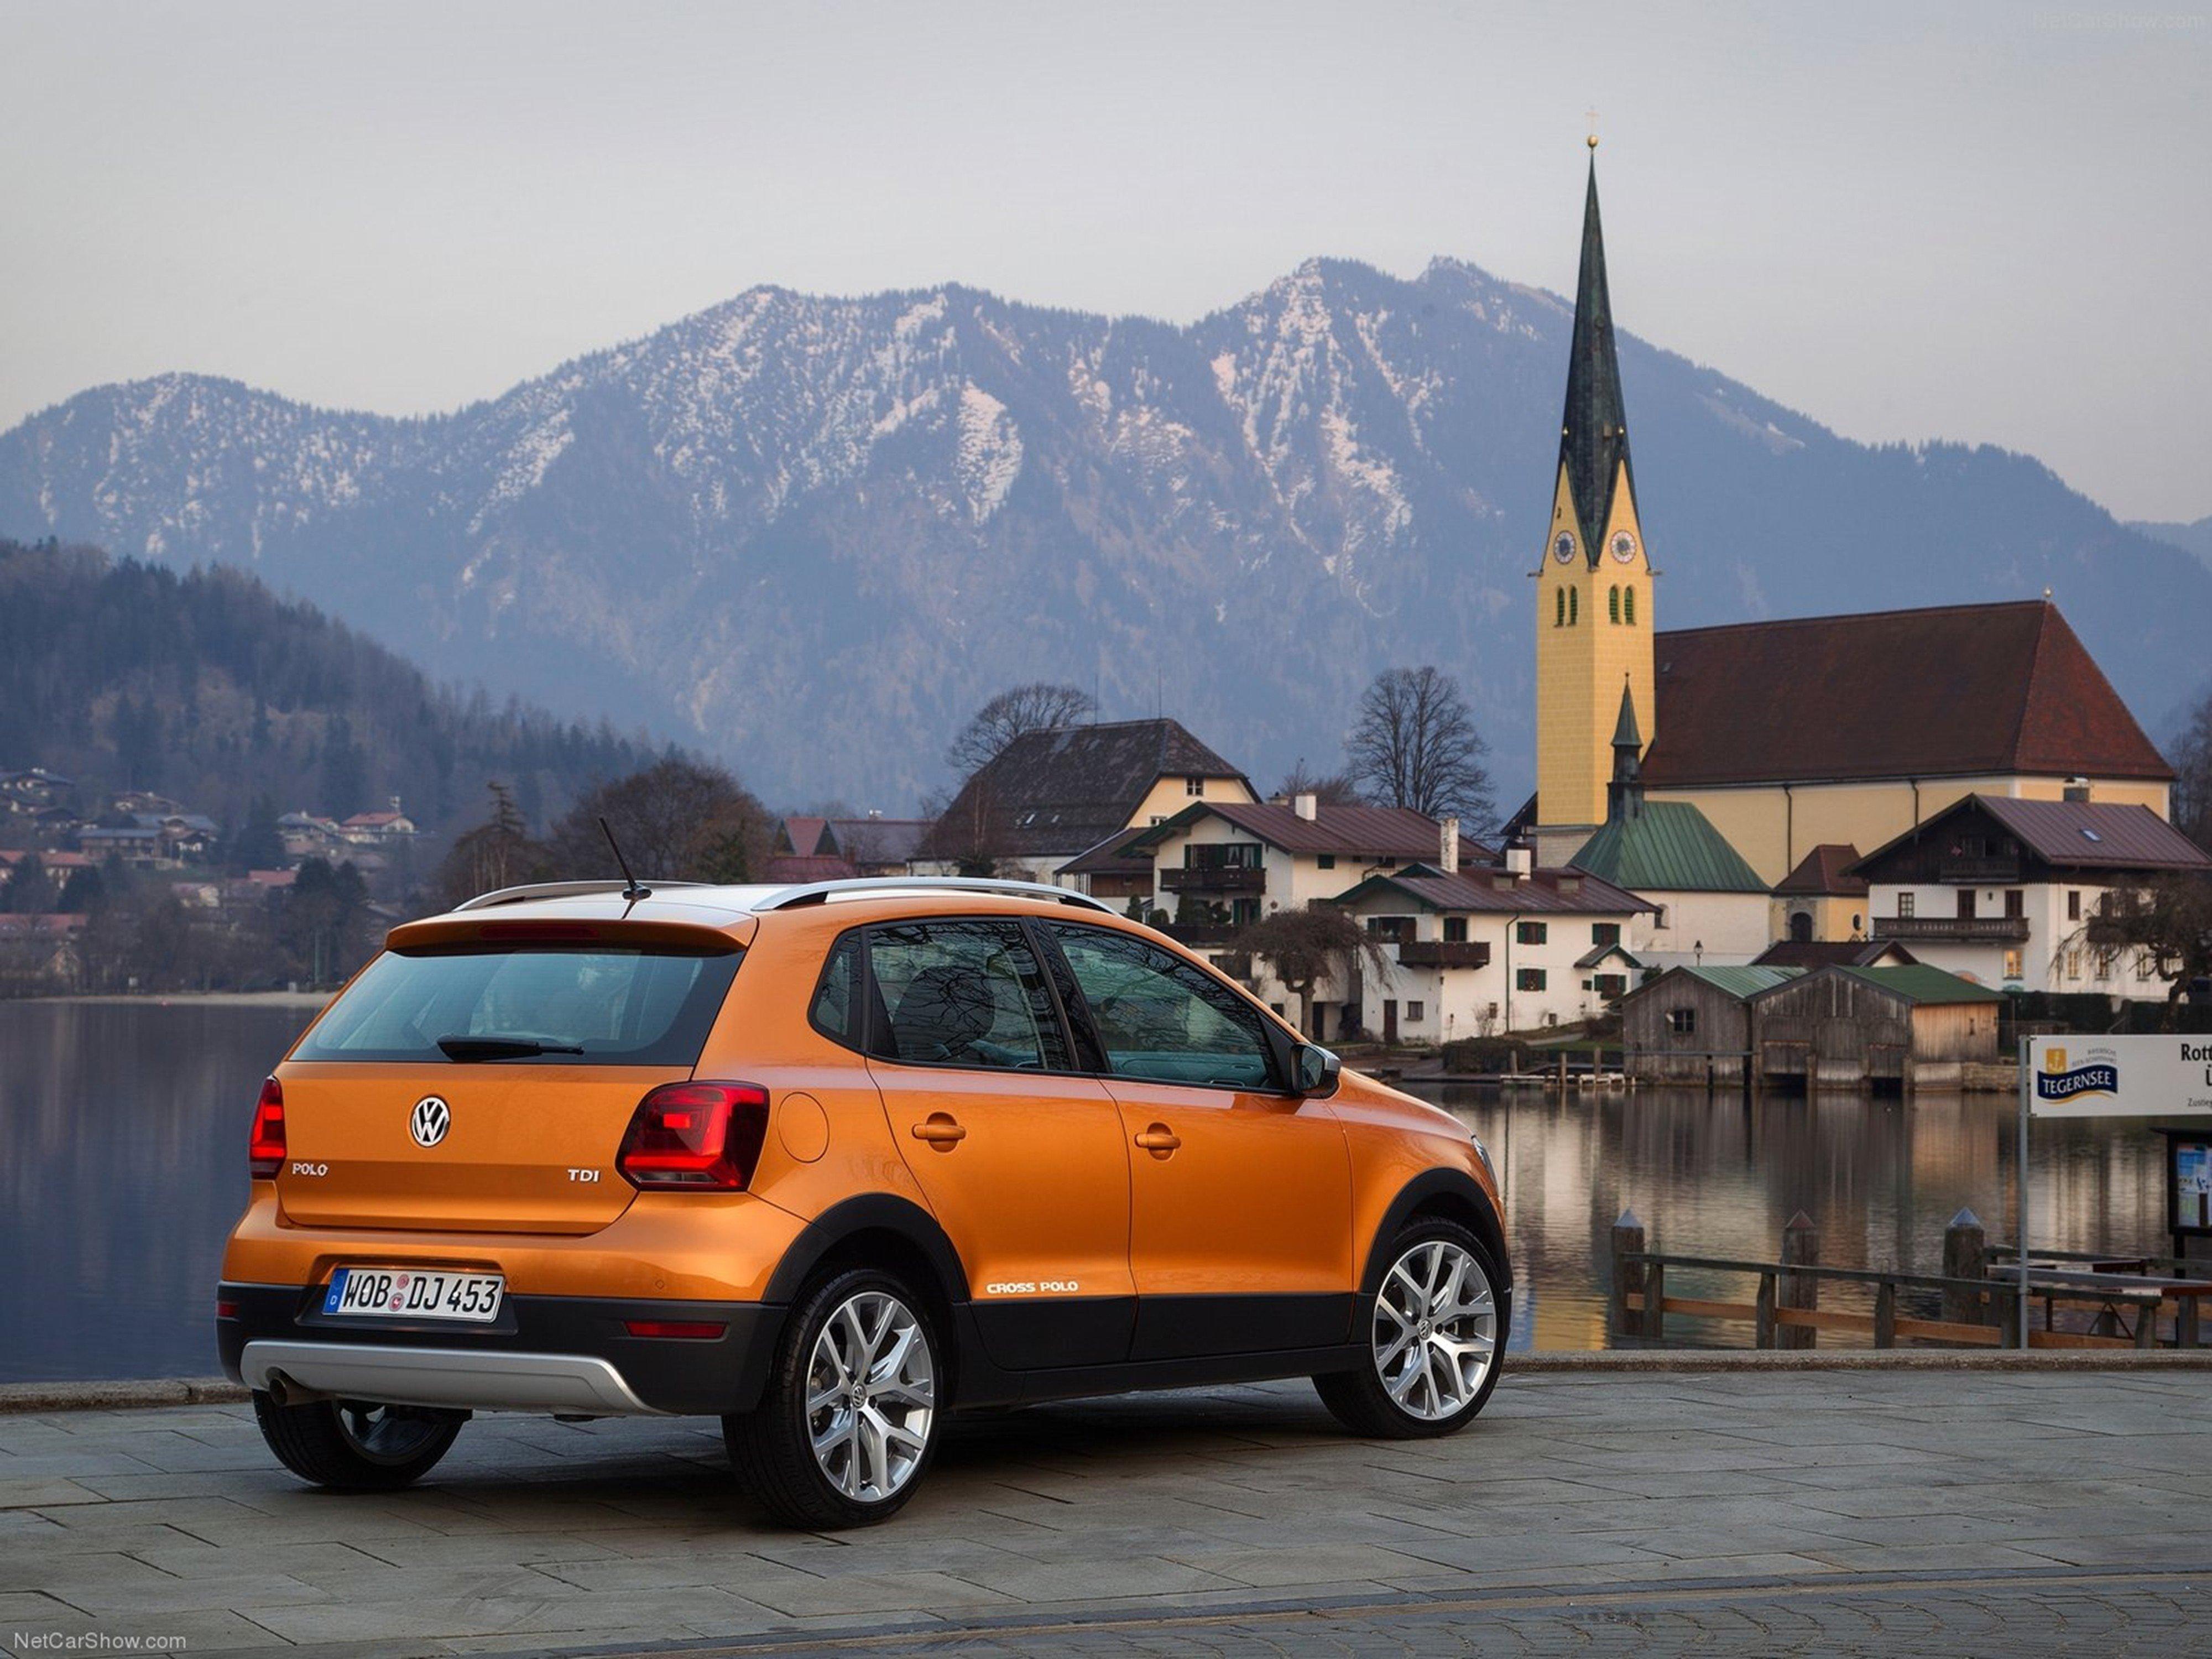 Volkswagen Cross Polo 2014 wallpaper 0d 4000x3000 wallpaper 4000x3000